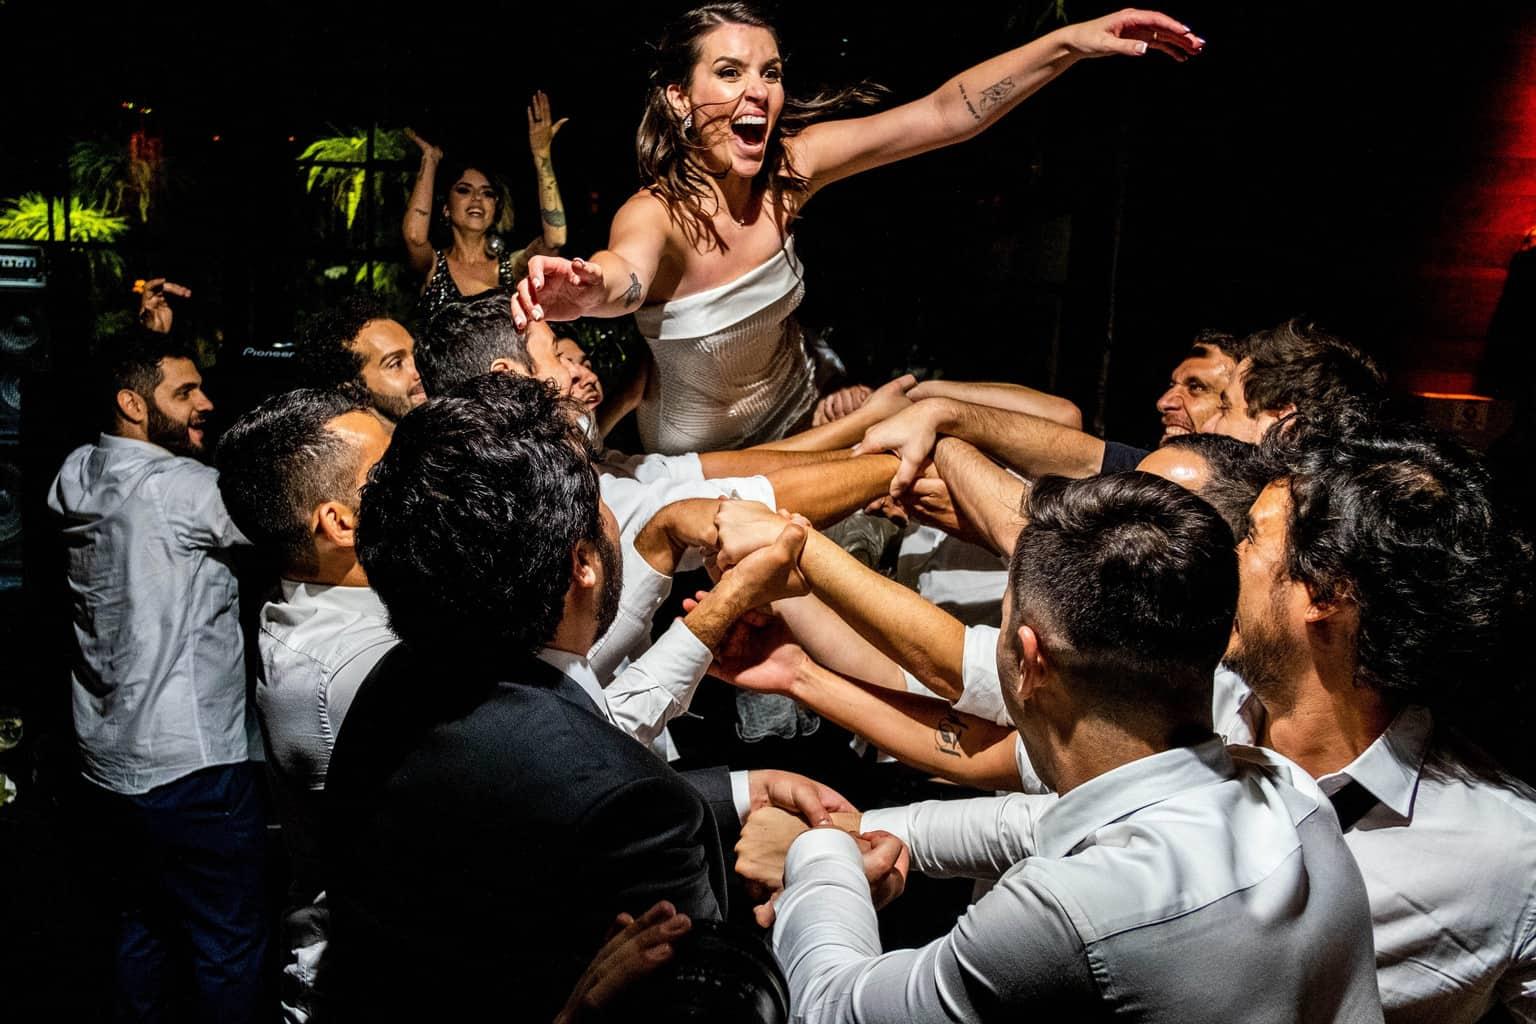 Bel-Benkler-eventos-Casamento-Ariane-e-Matheus-cerimonia-decoracao-contemporanea-fotografia-Rafael-Bigarelli-noivos-na-pista-Spazio-Giardini-53